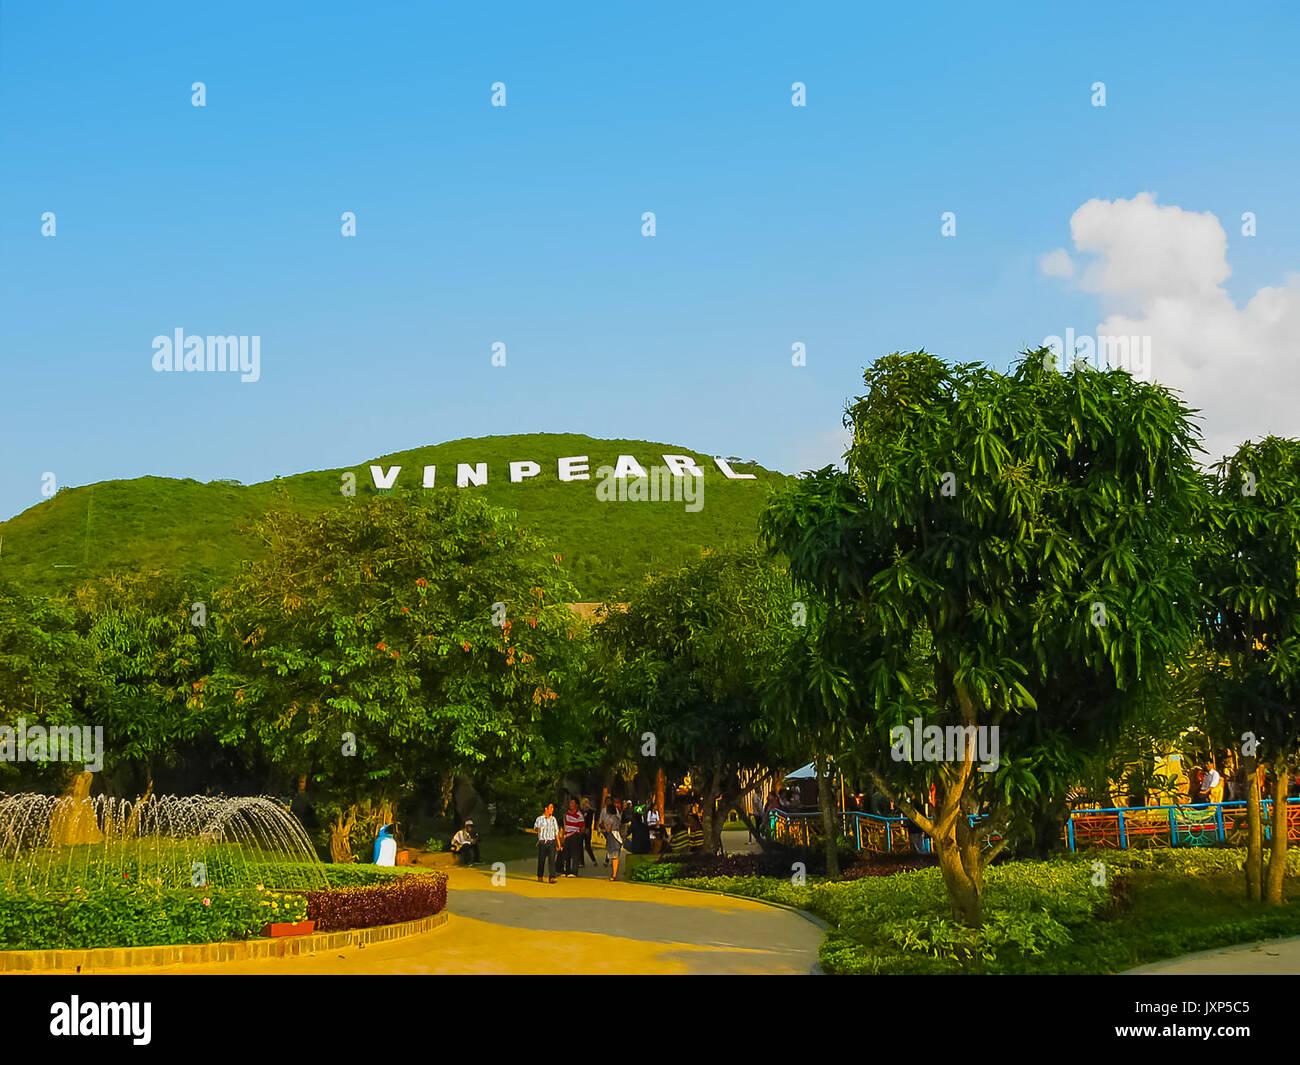 Nha Trang, Vietnam - February 12, 2011: The Hon Tre Island or Vinperl Amusement Park - Stock Image